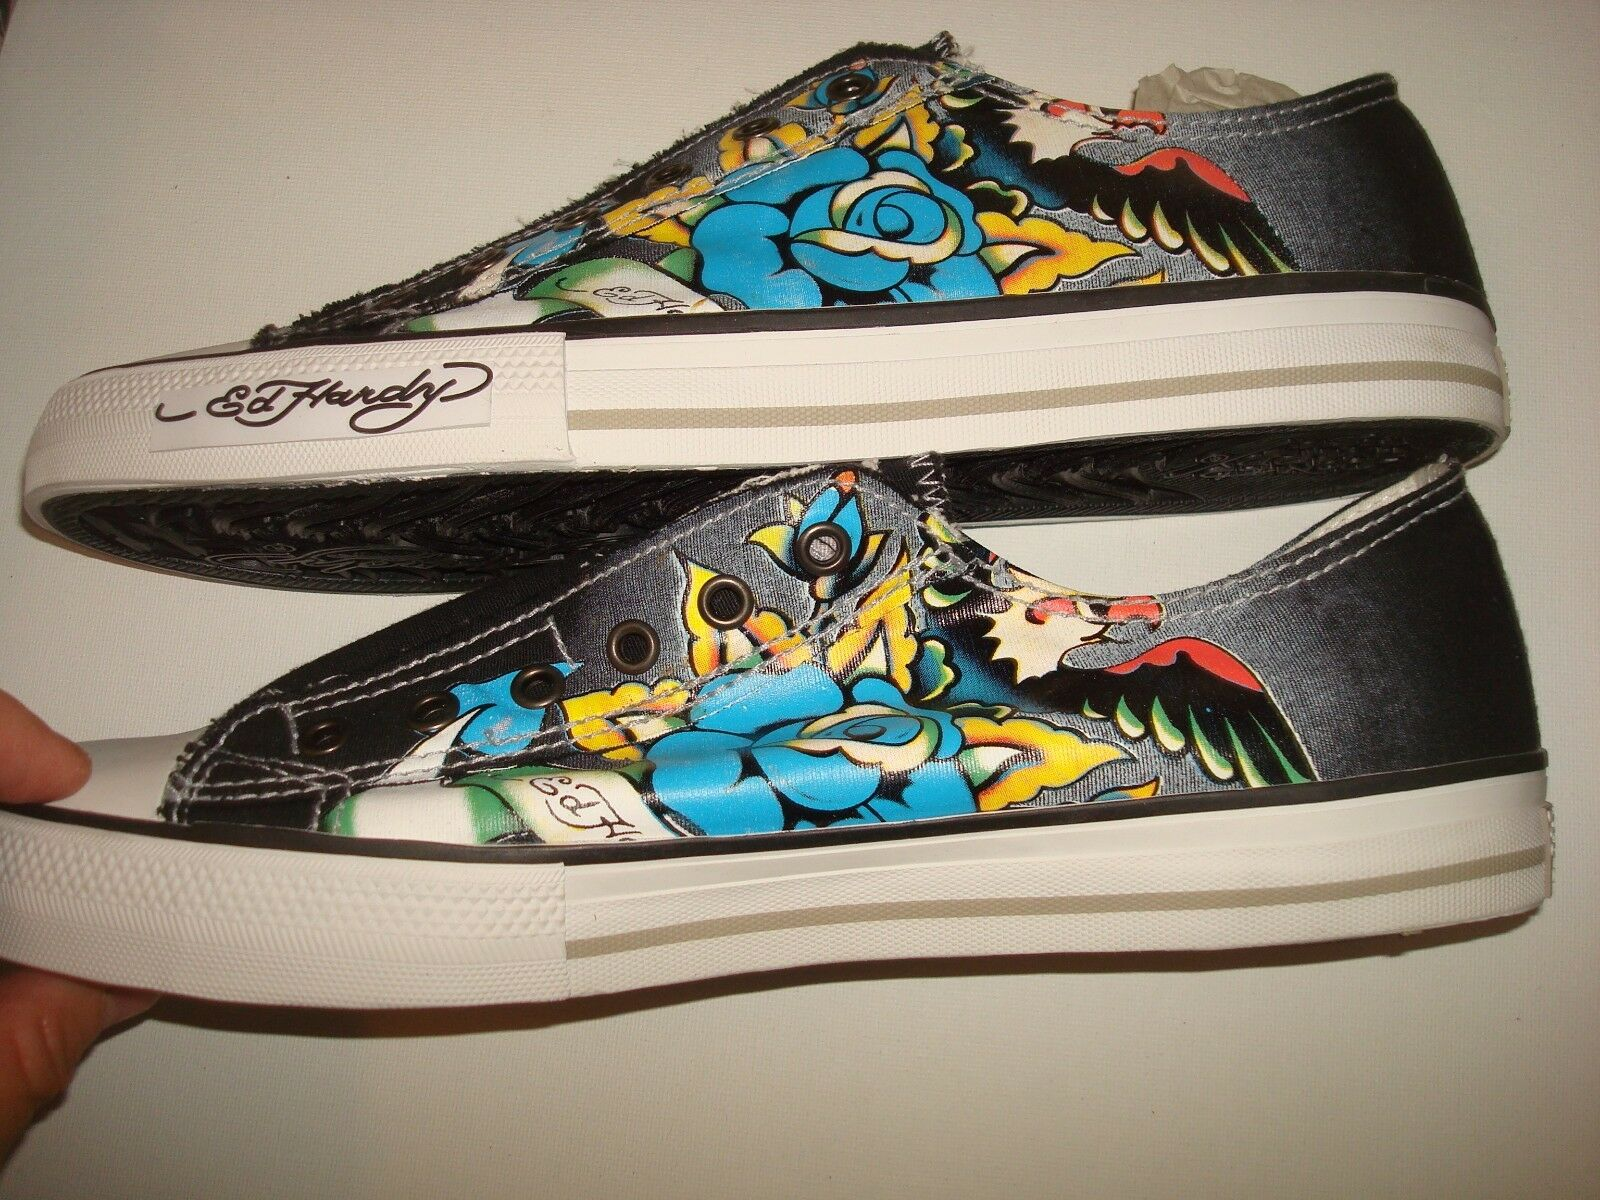 Uomo Ed Hardy ANNIVERSARY nero Lowrise Slip-On scarpe scarpe scarpe scarpe da ginnastica Sz 11 NEW IN BOX e49138